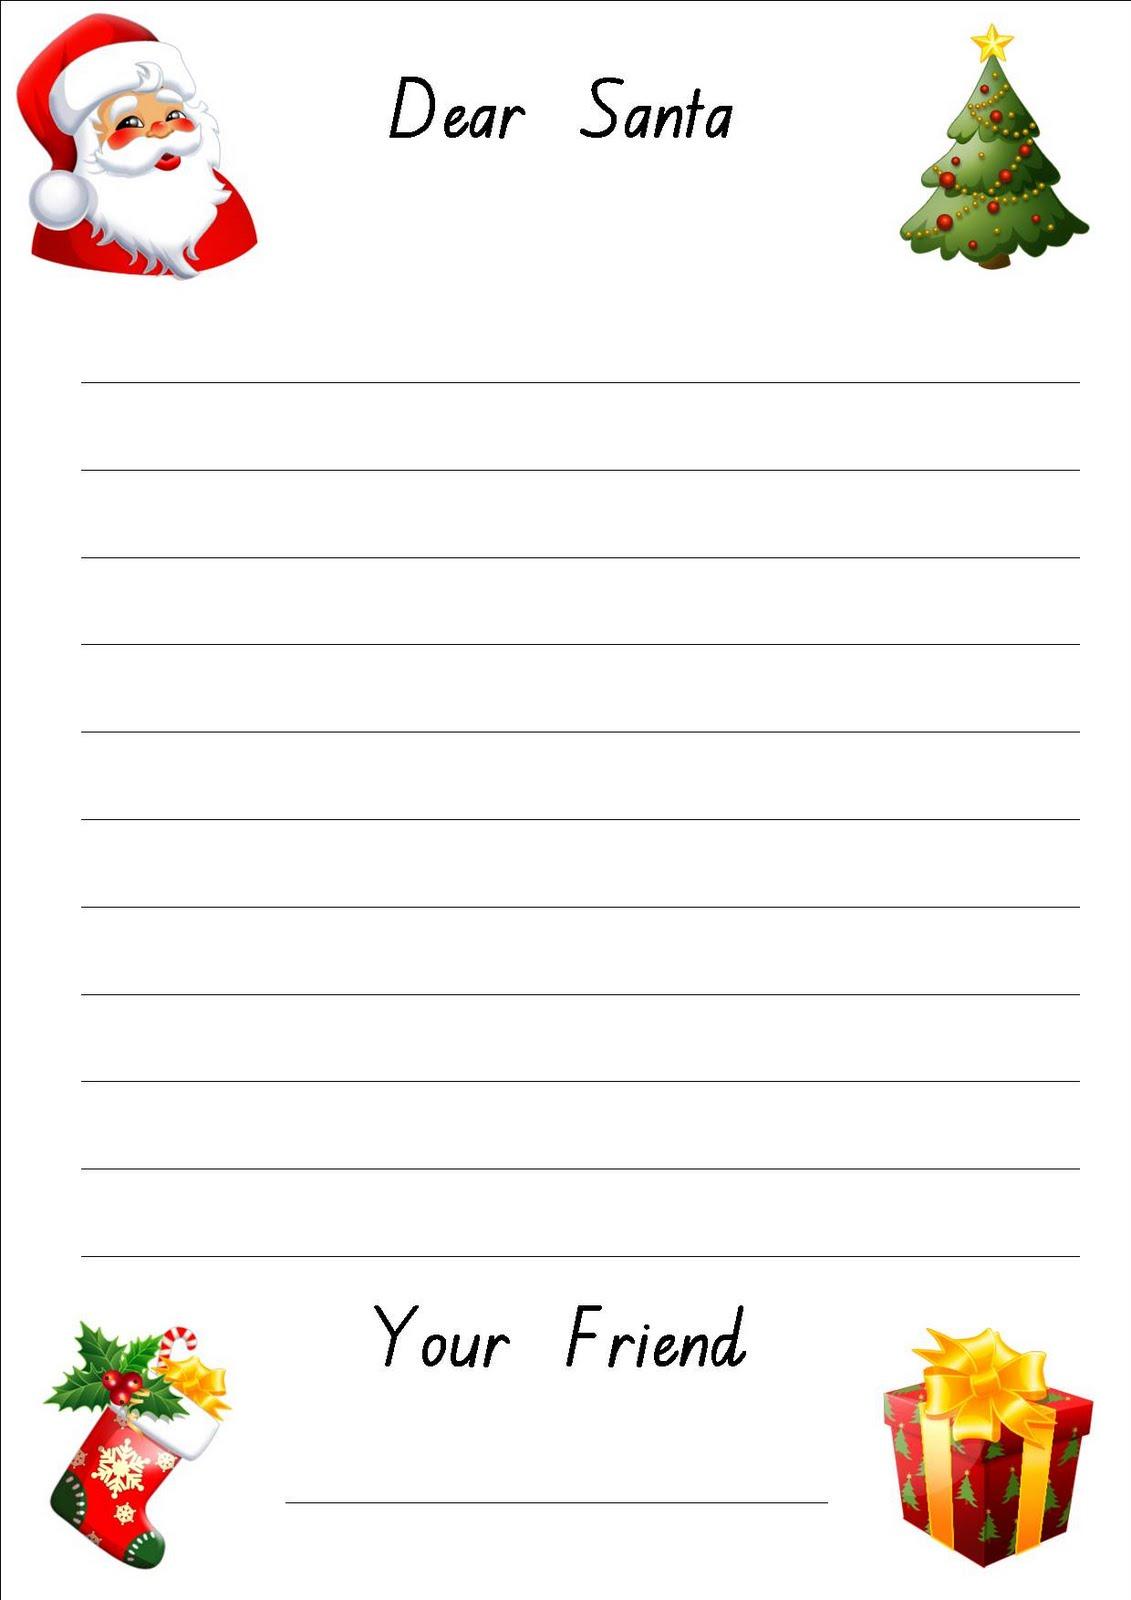 Dear Santa Anglokids